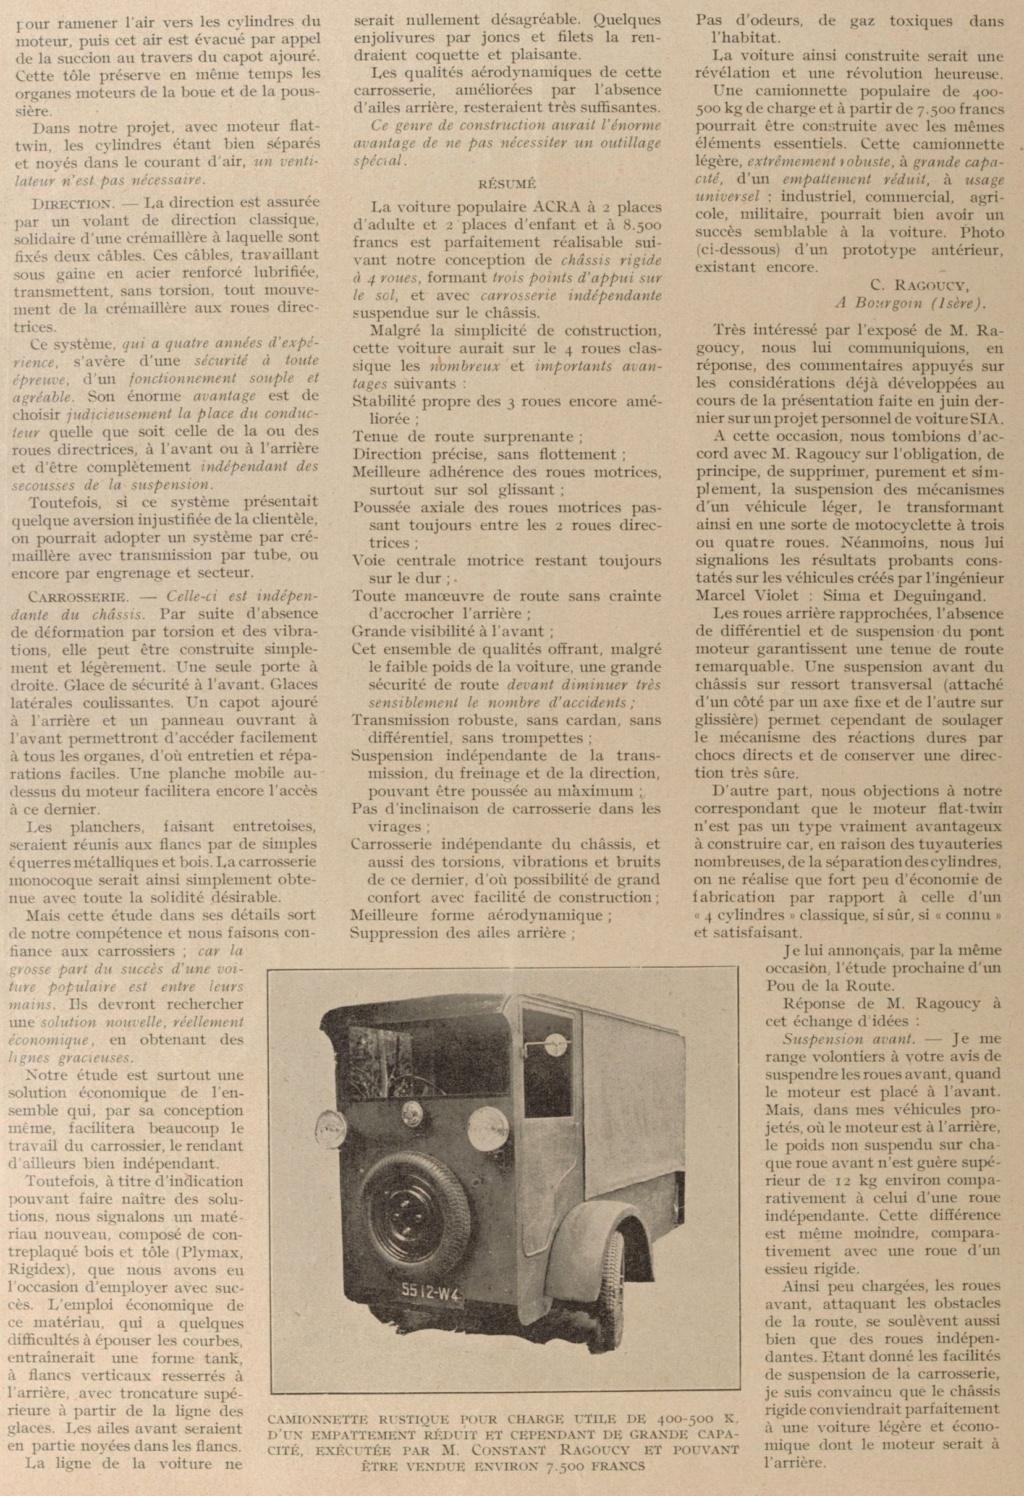 Tricyclecar RAGOUCY 193